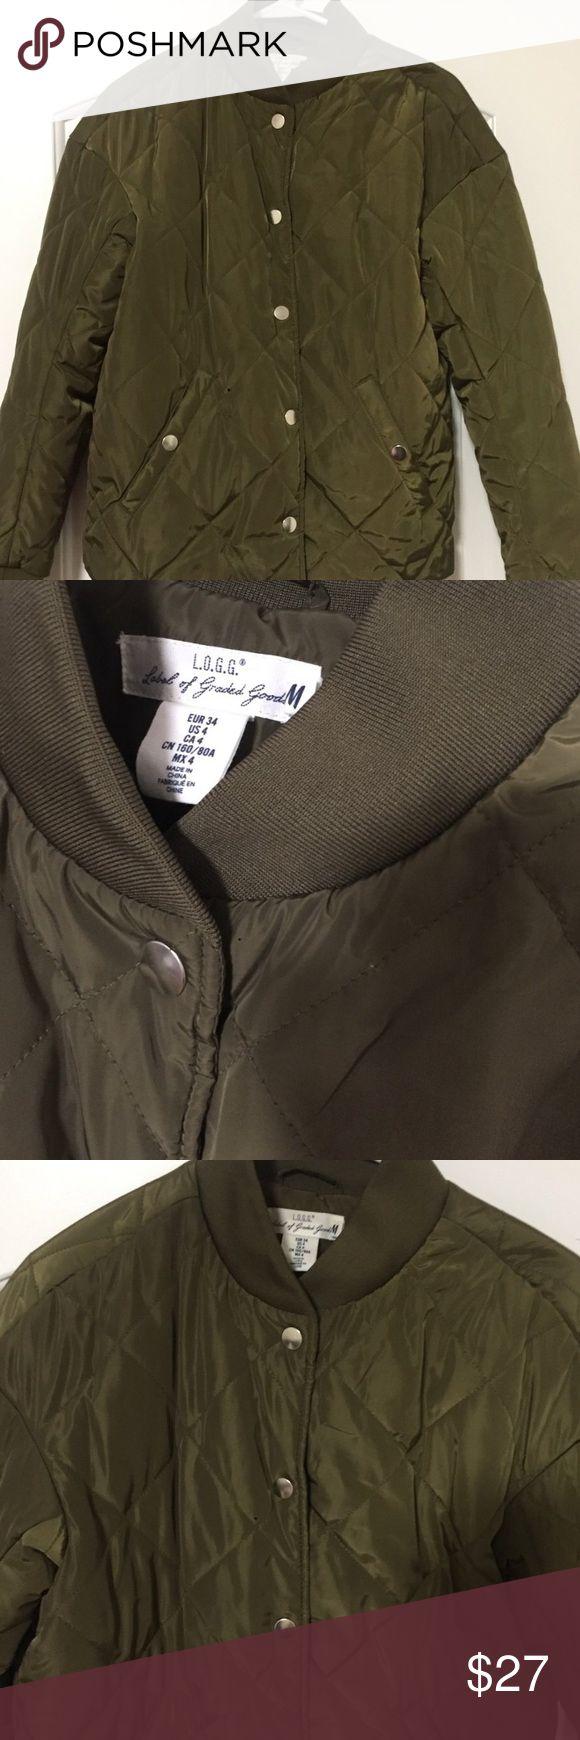 H&M green bomber jacket Army green bomber jacket H&M Jackets & Coats Utility Jackets